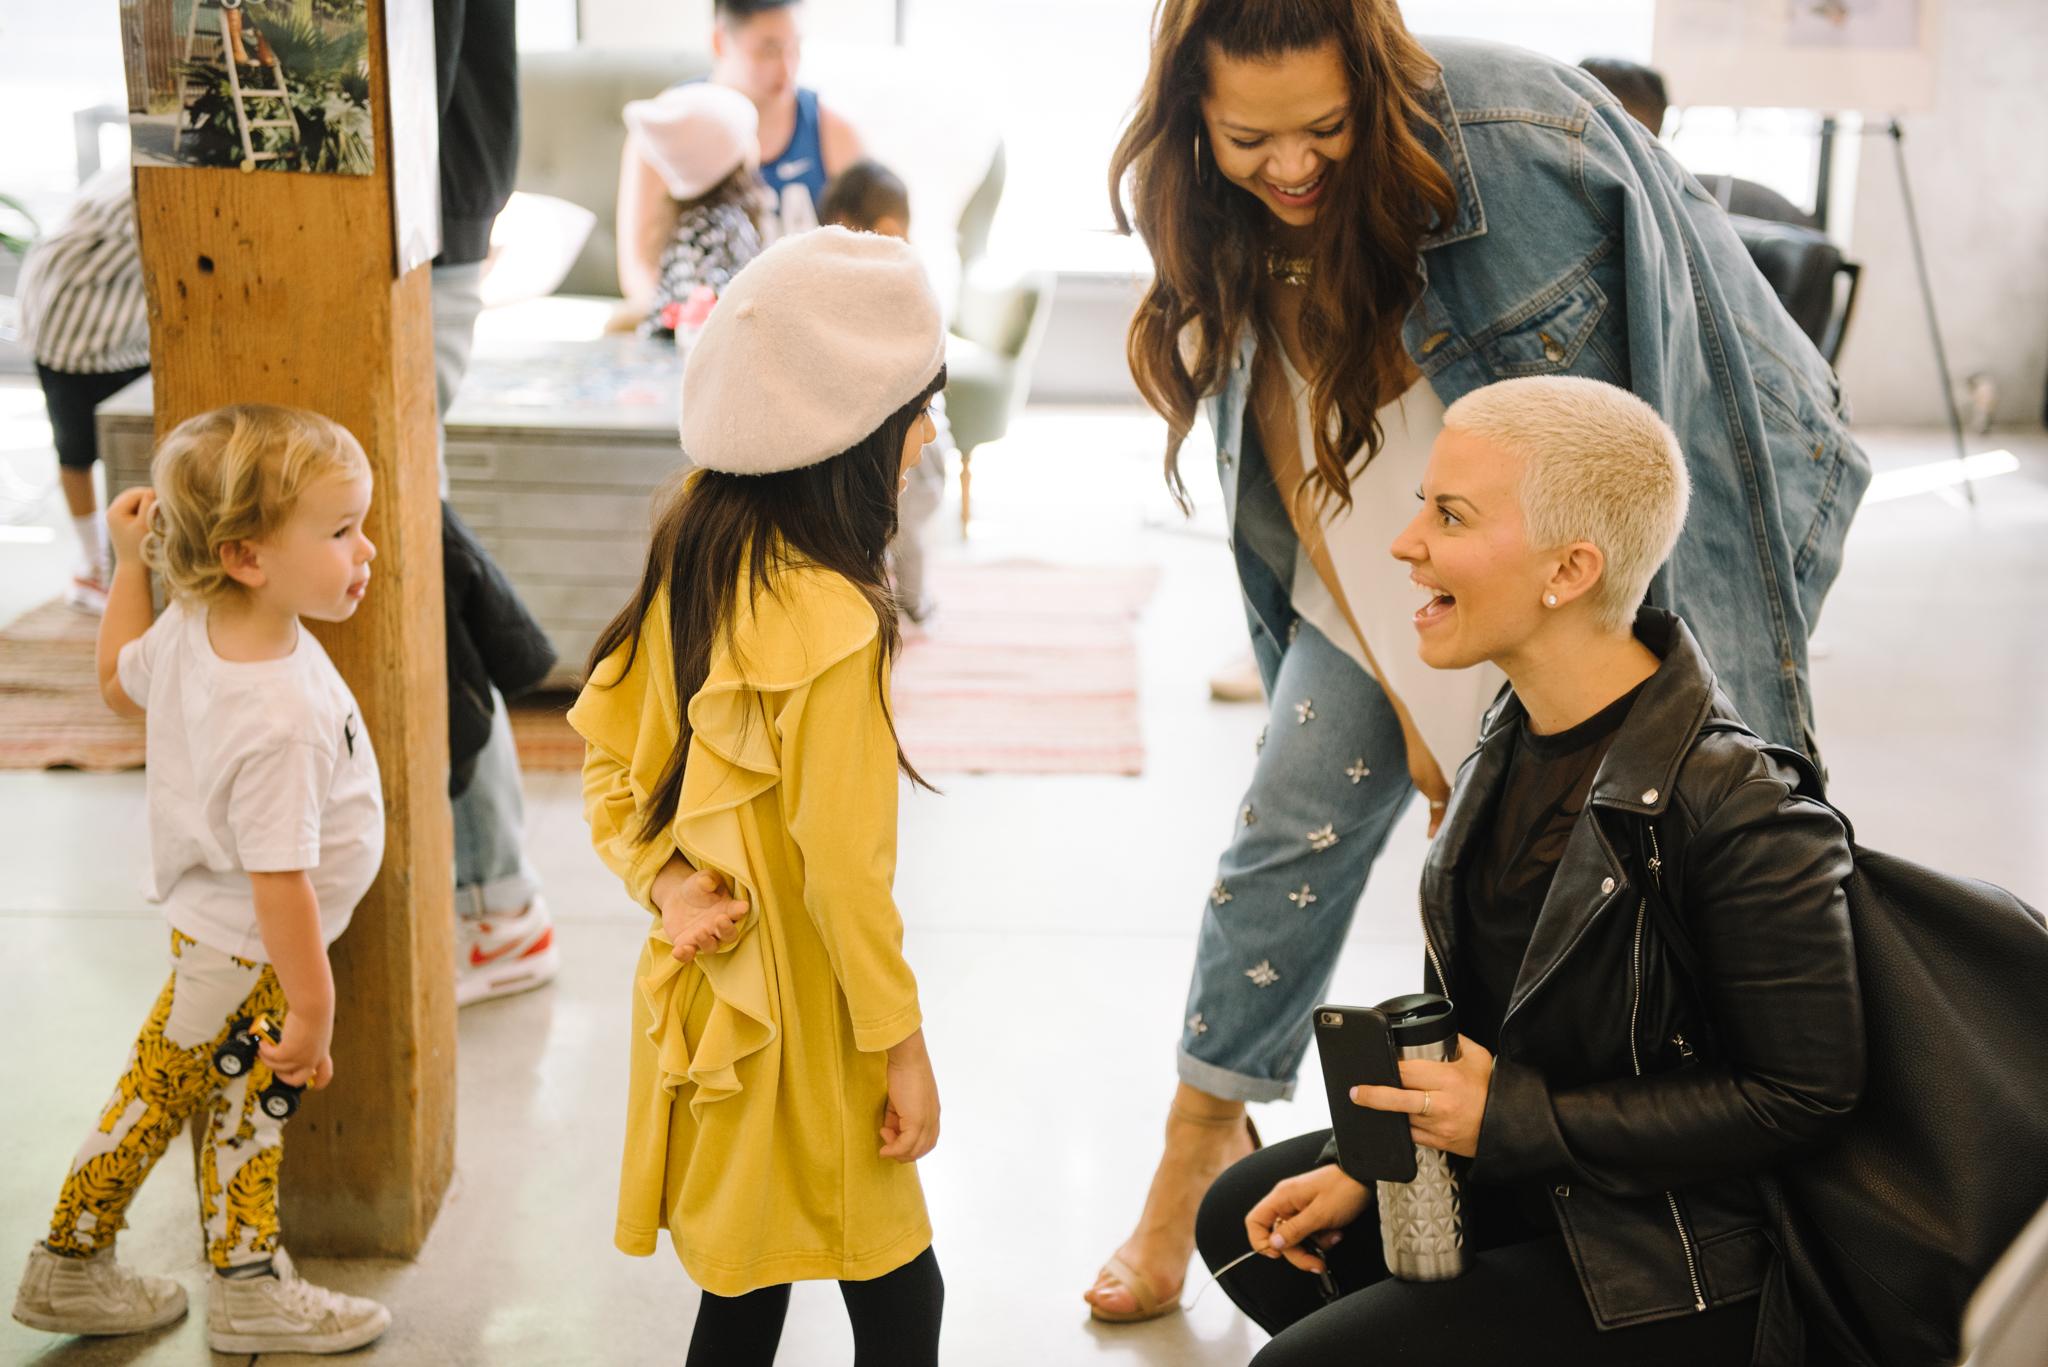 Chelsea Leifken  with Giana  @G.Von.G , at JIG+SAW x Fashion Mama Art Show